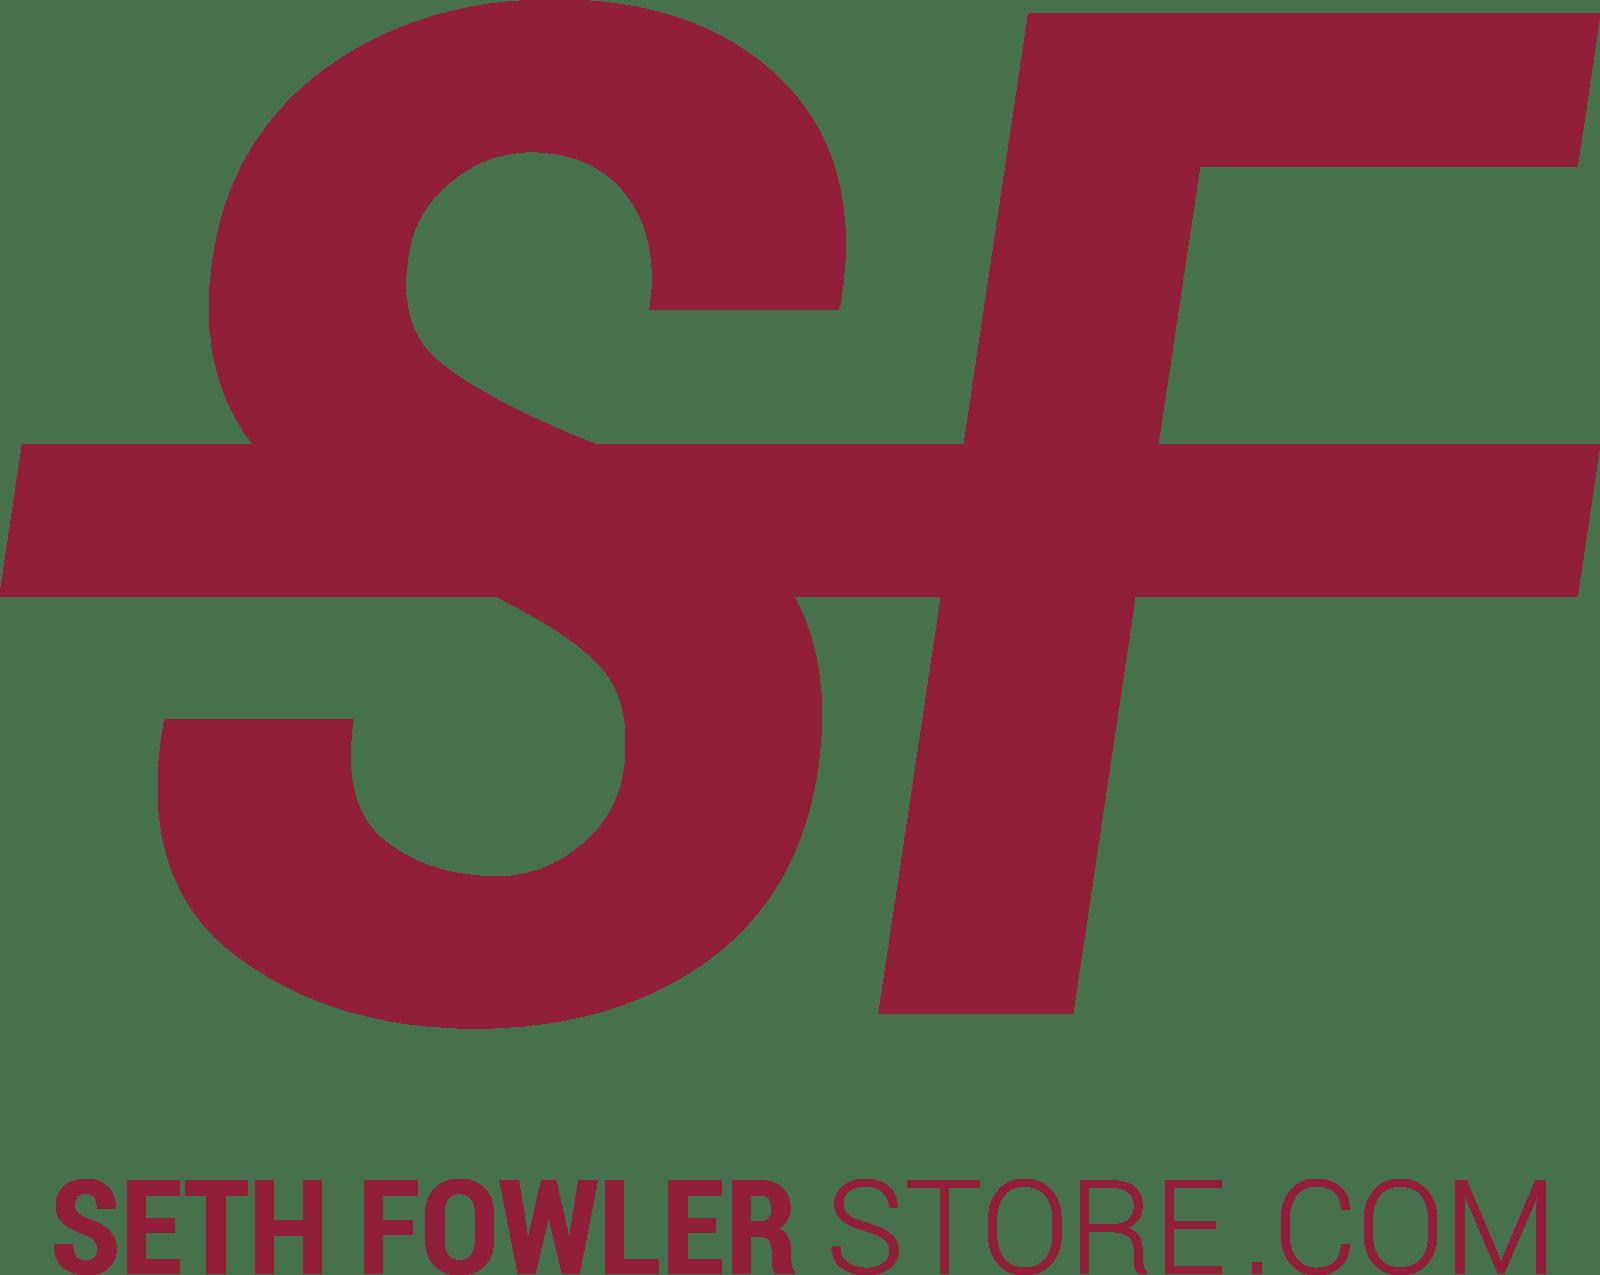 Seth Fowler Store